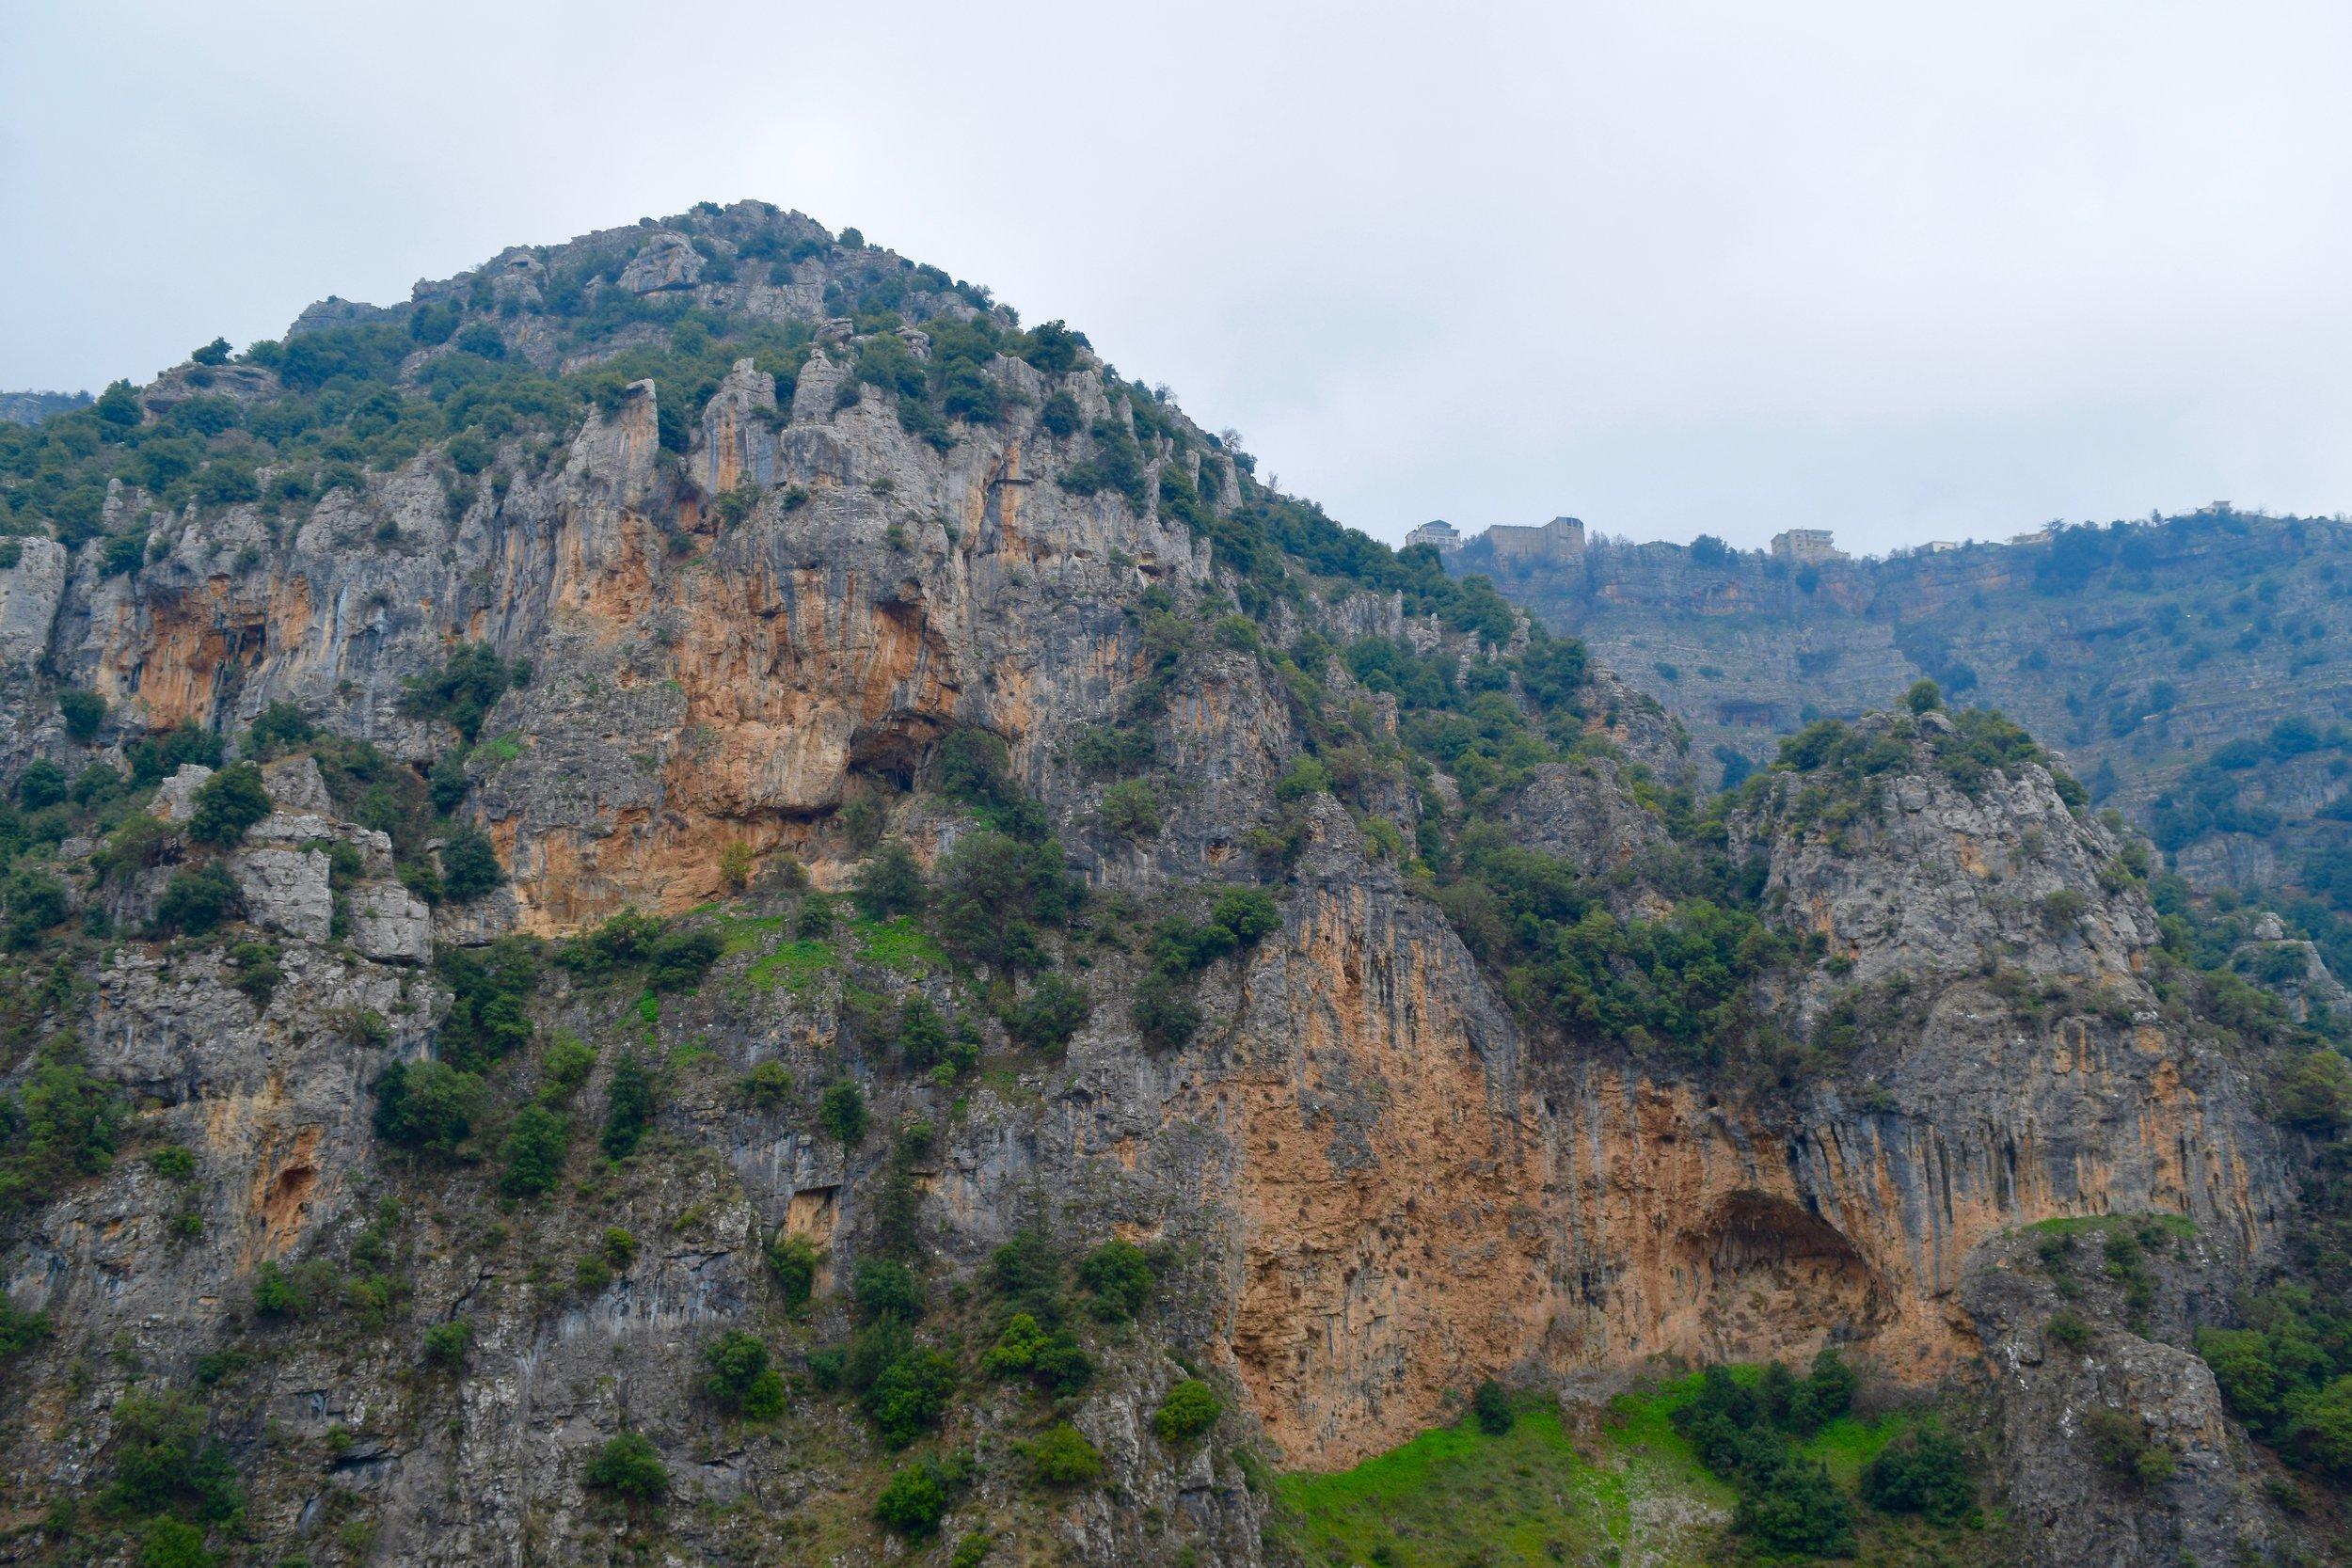 Views of the Qadisha Valley